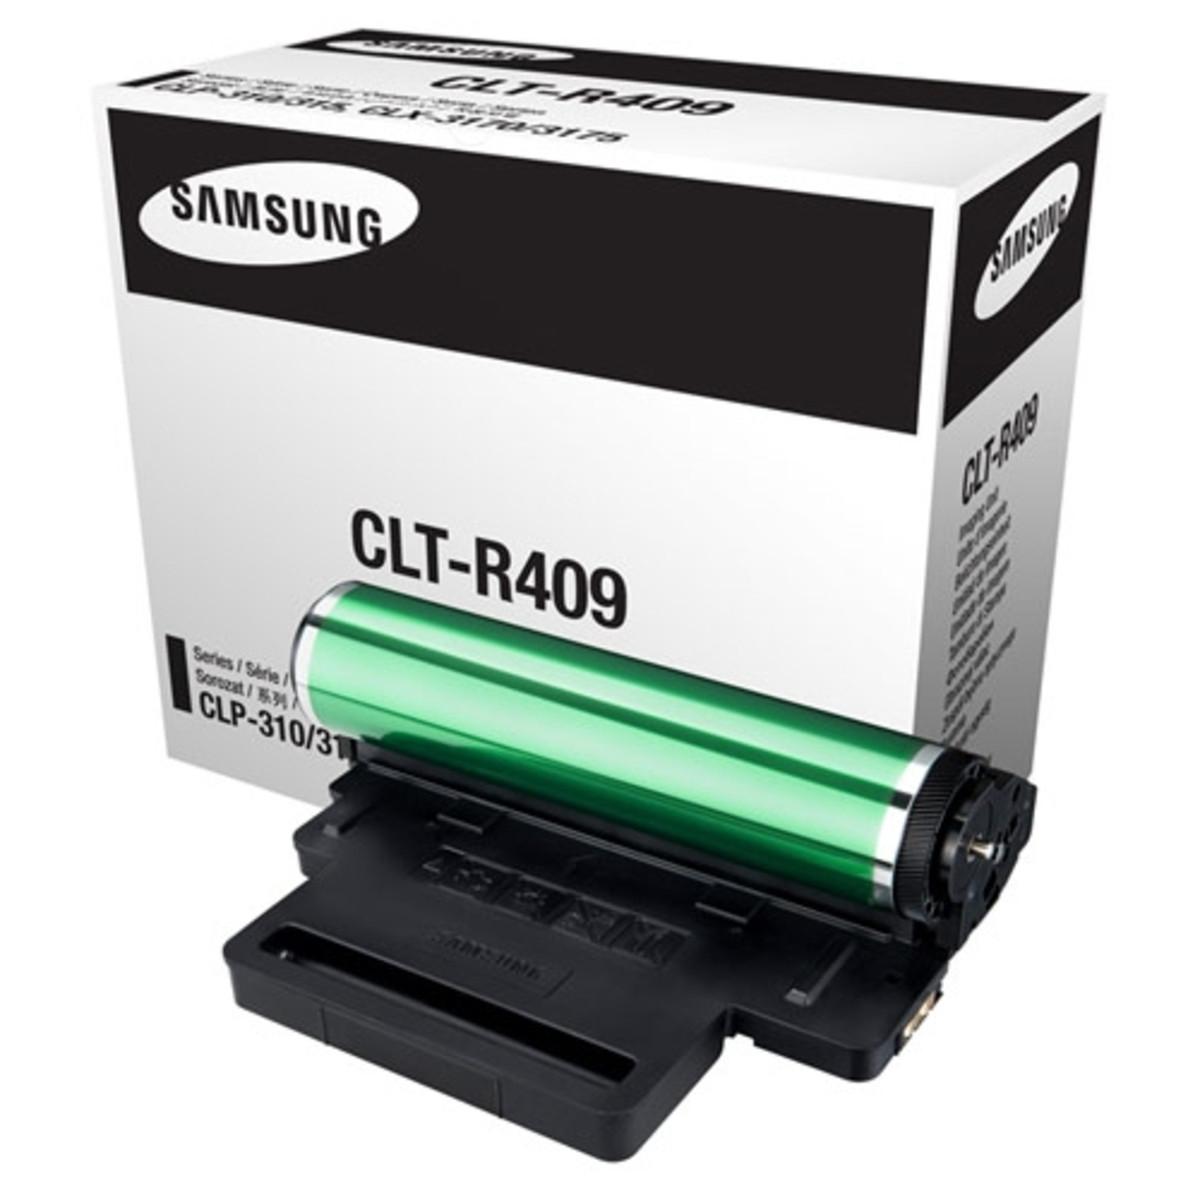 Samsung CLT-R409S Drum Unit